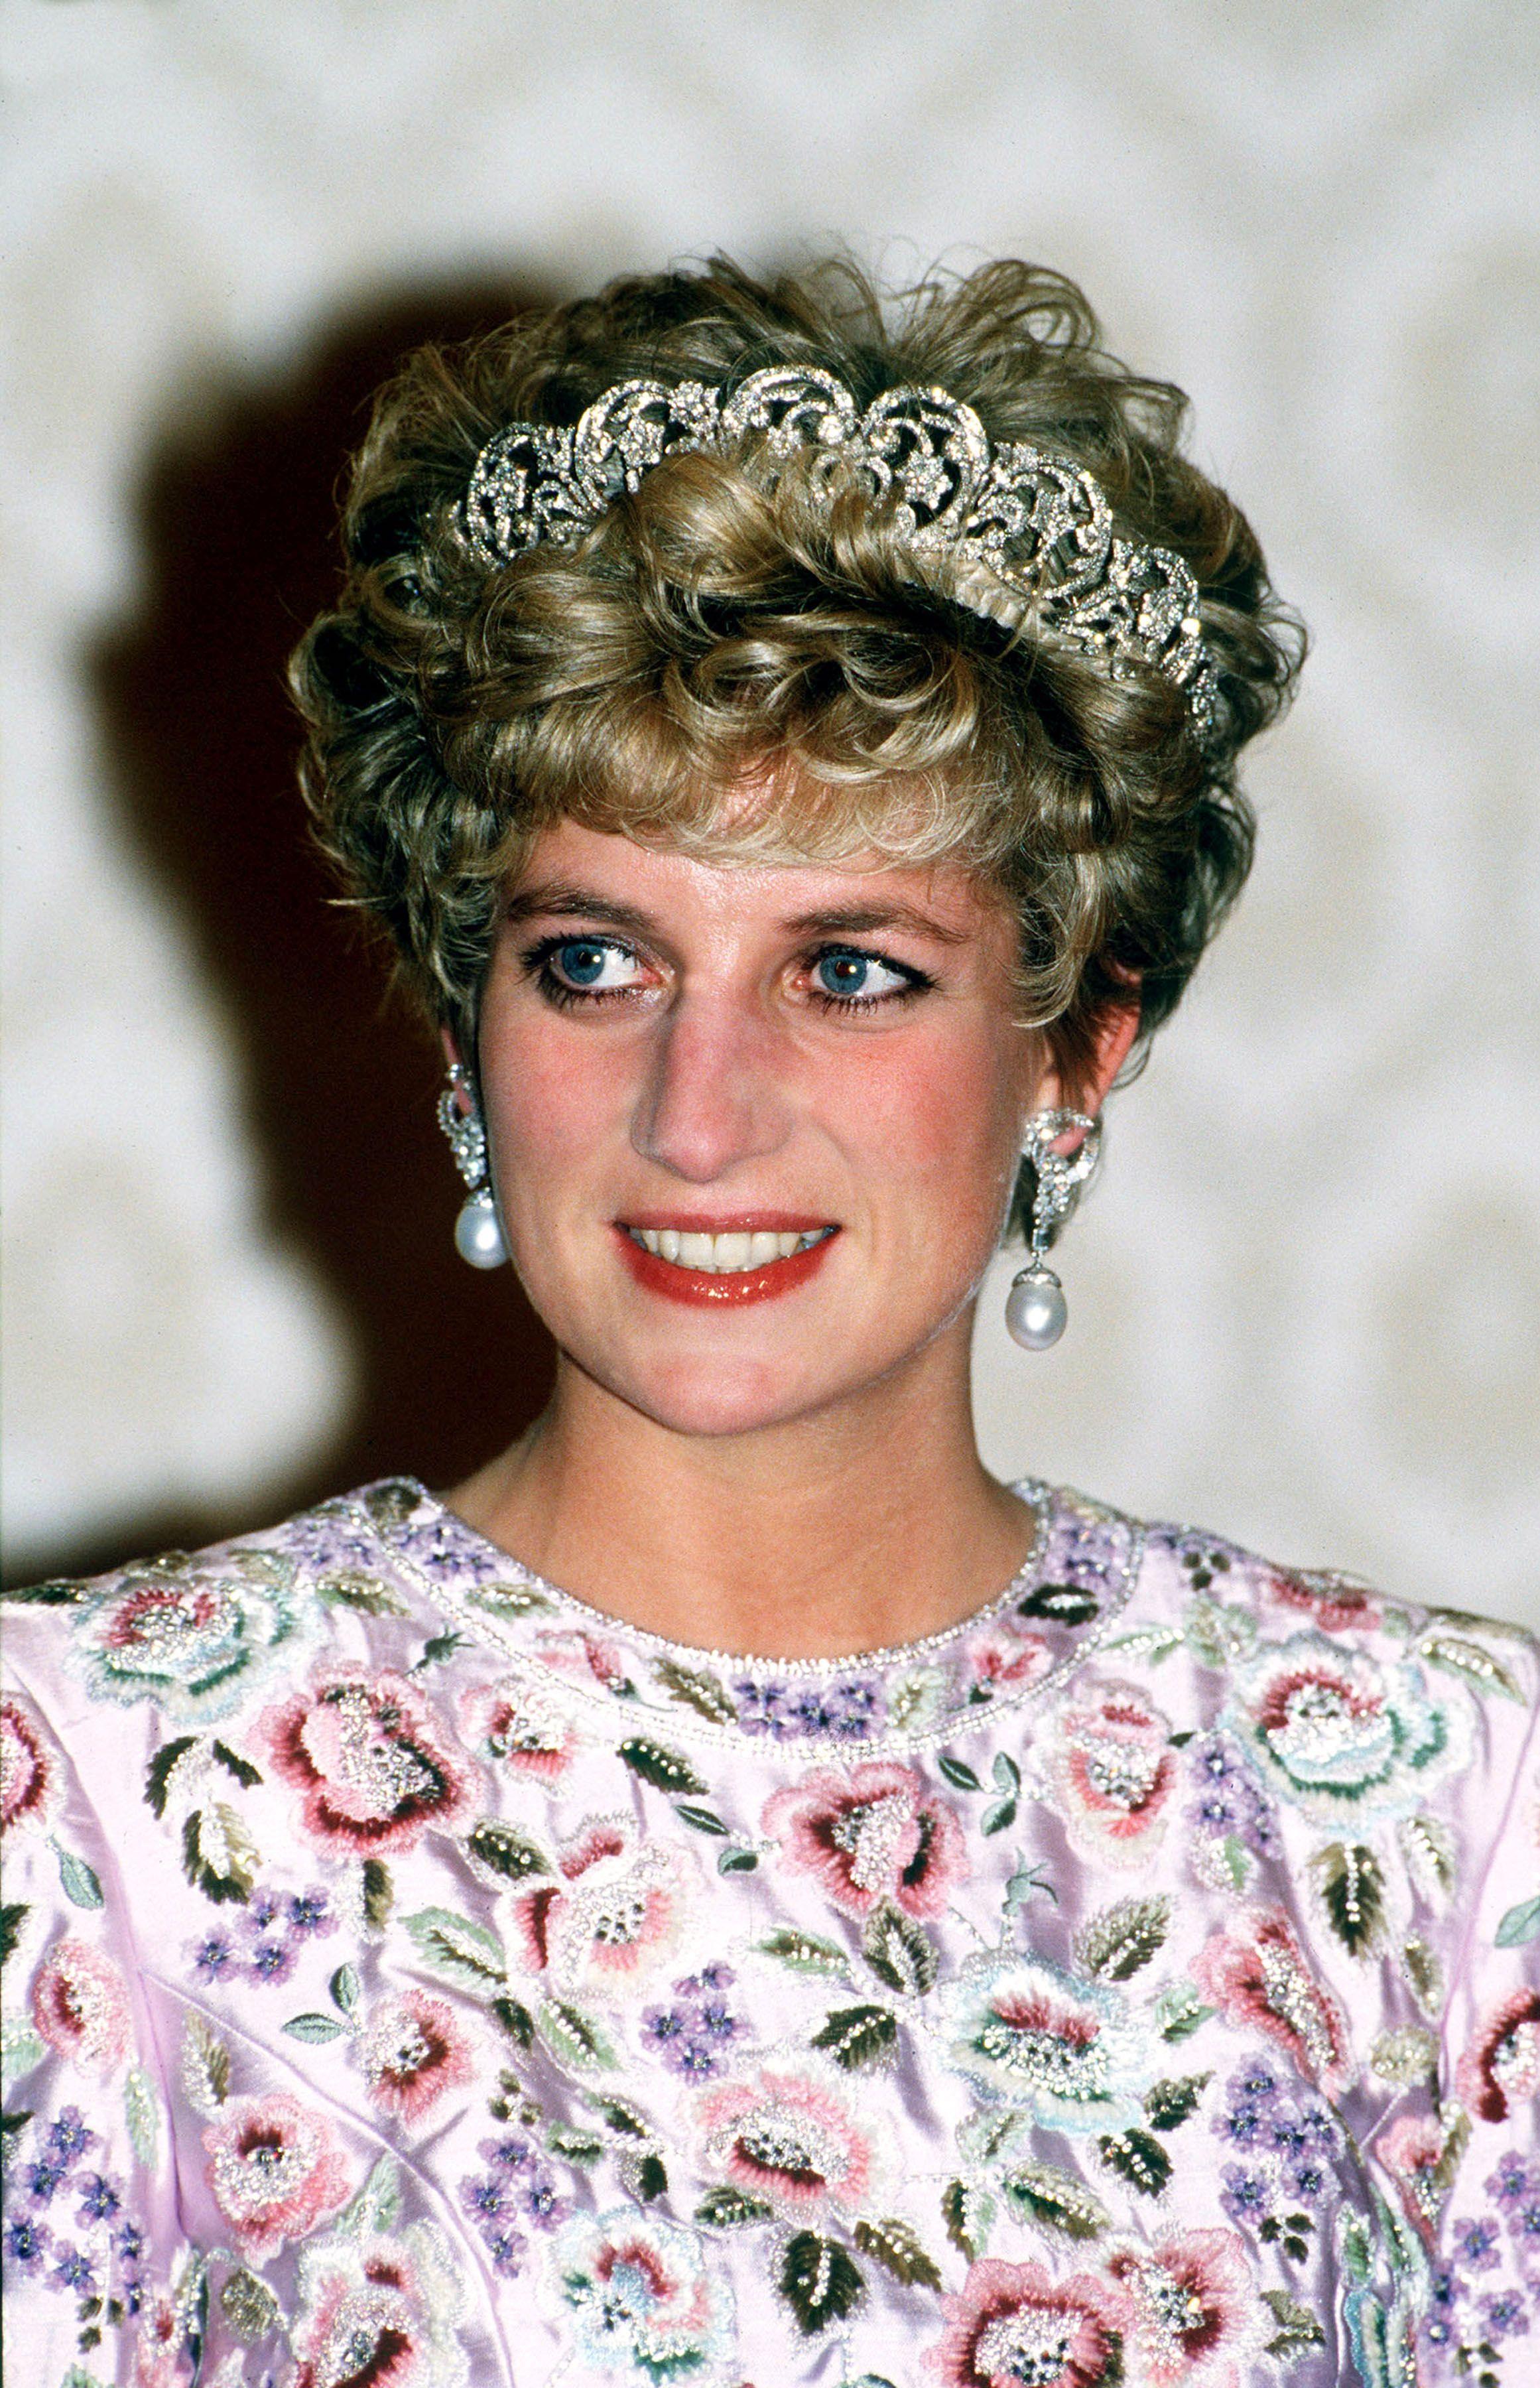 Pin De Estel Hc En Diana Lady Diana Boda De La Princesa Diana Princesa Diana